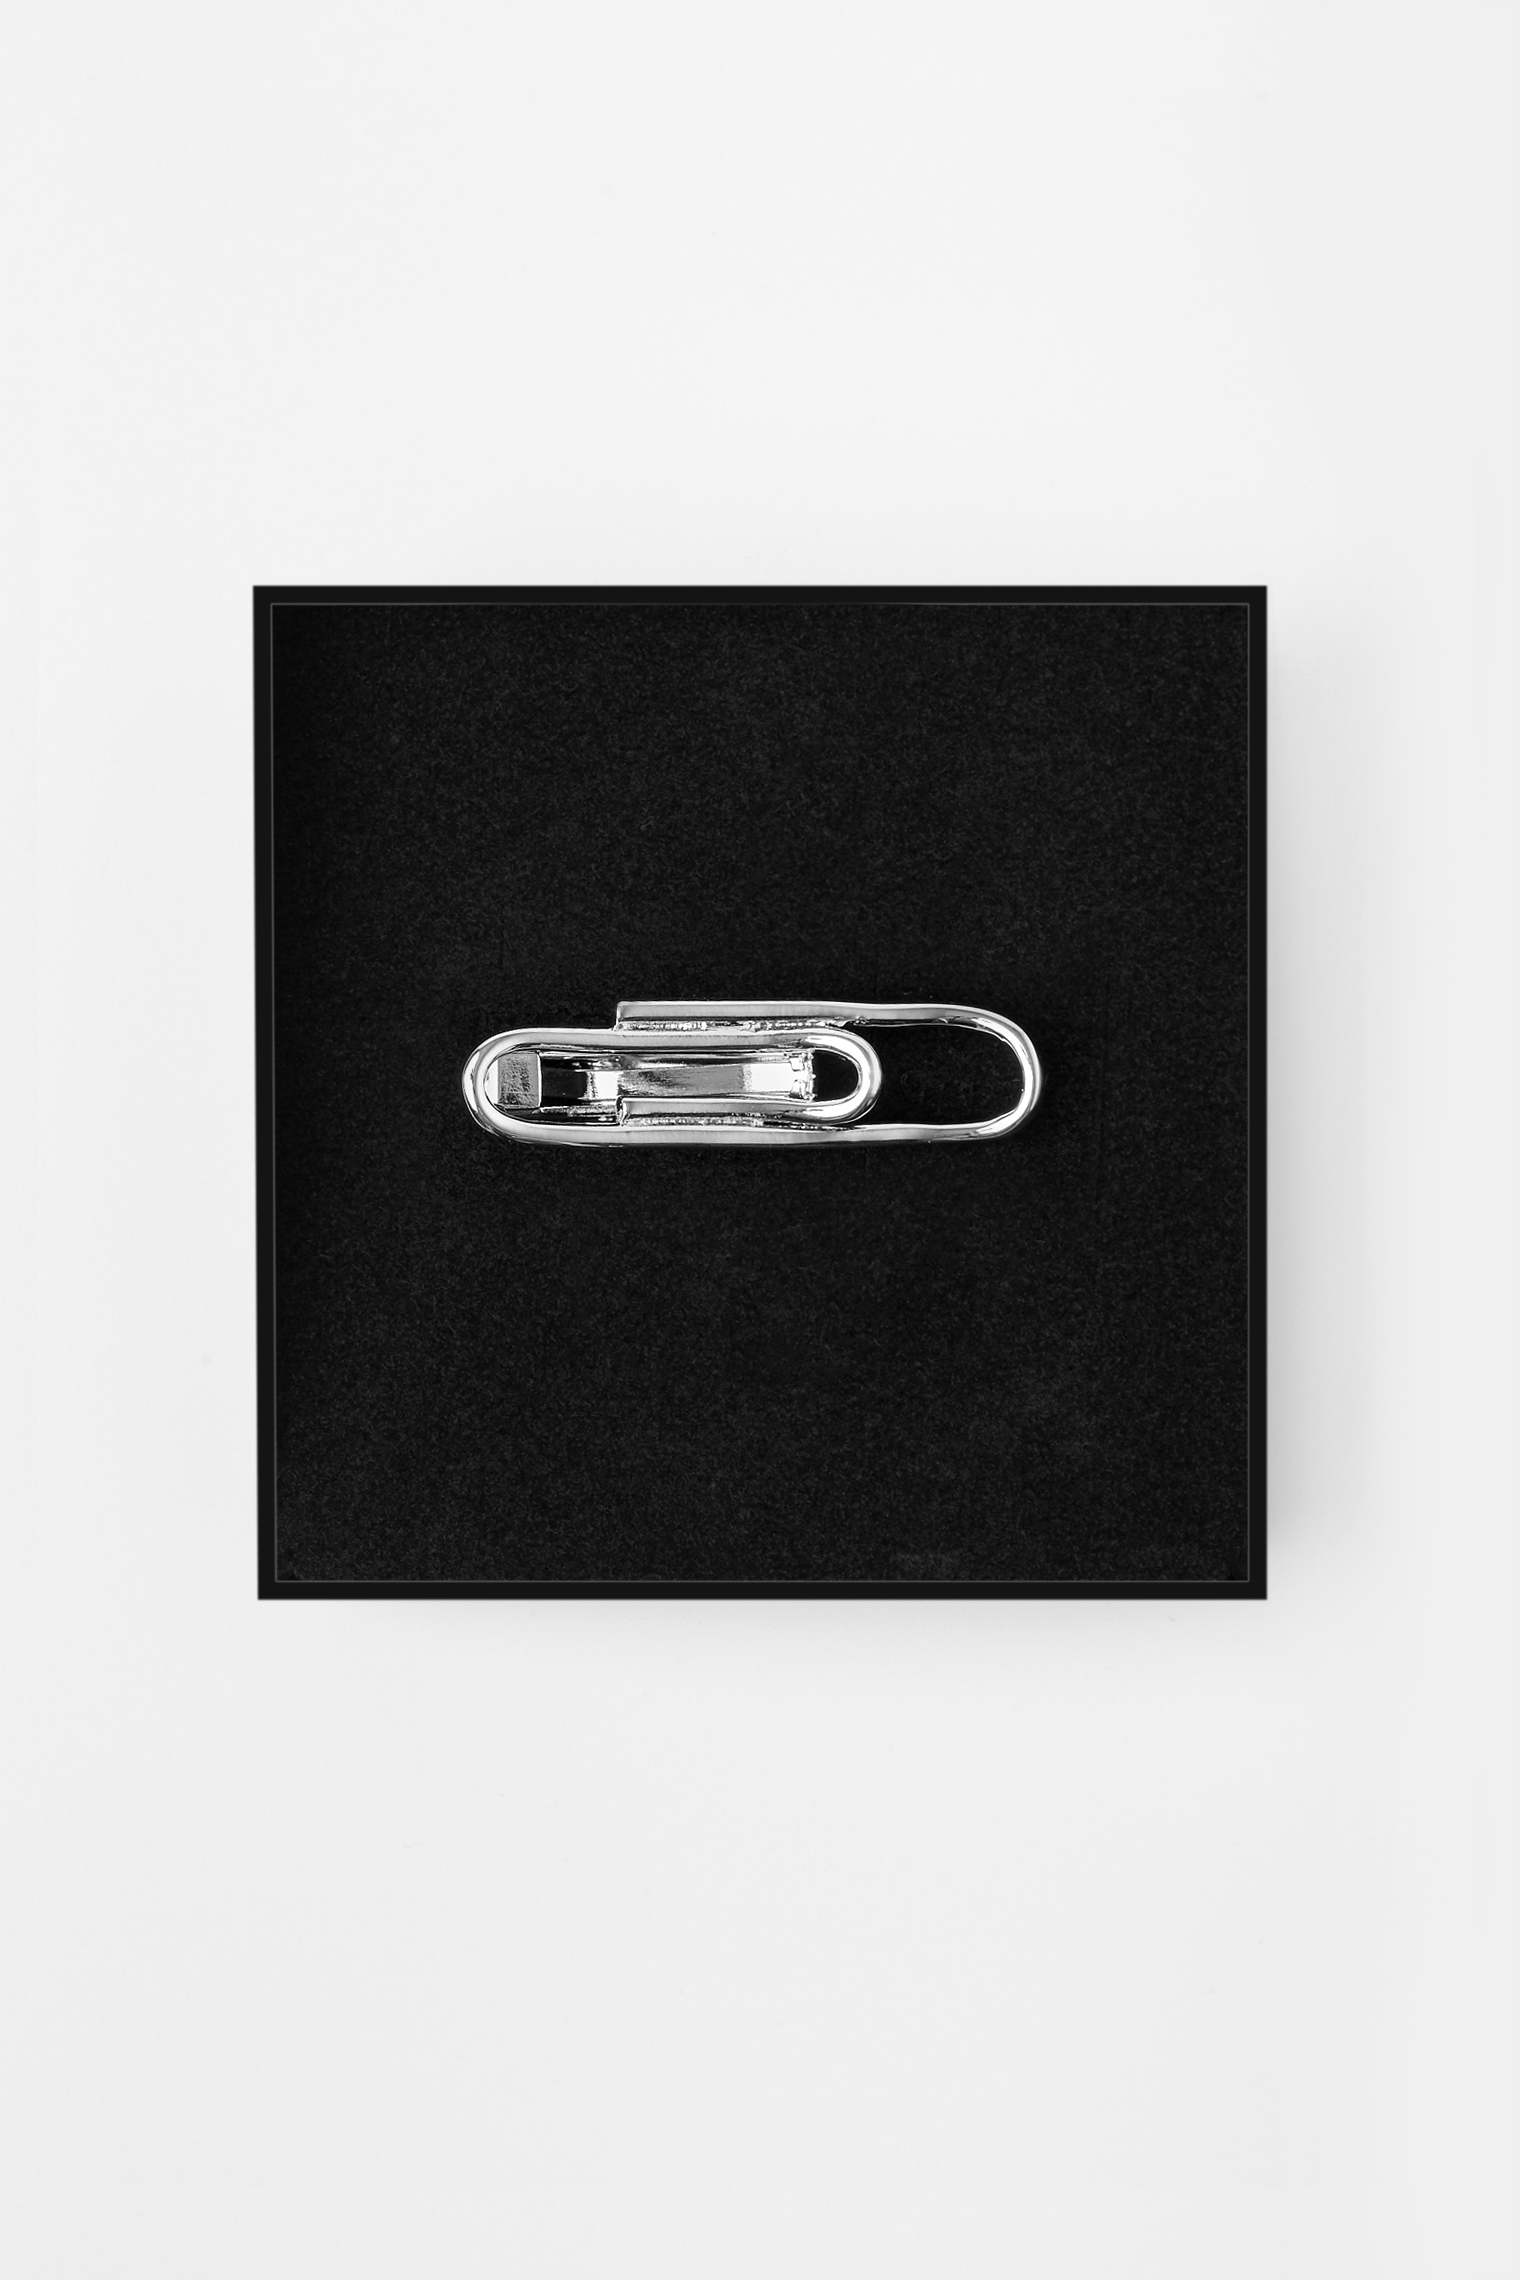 spinka recman krawat 205